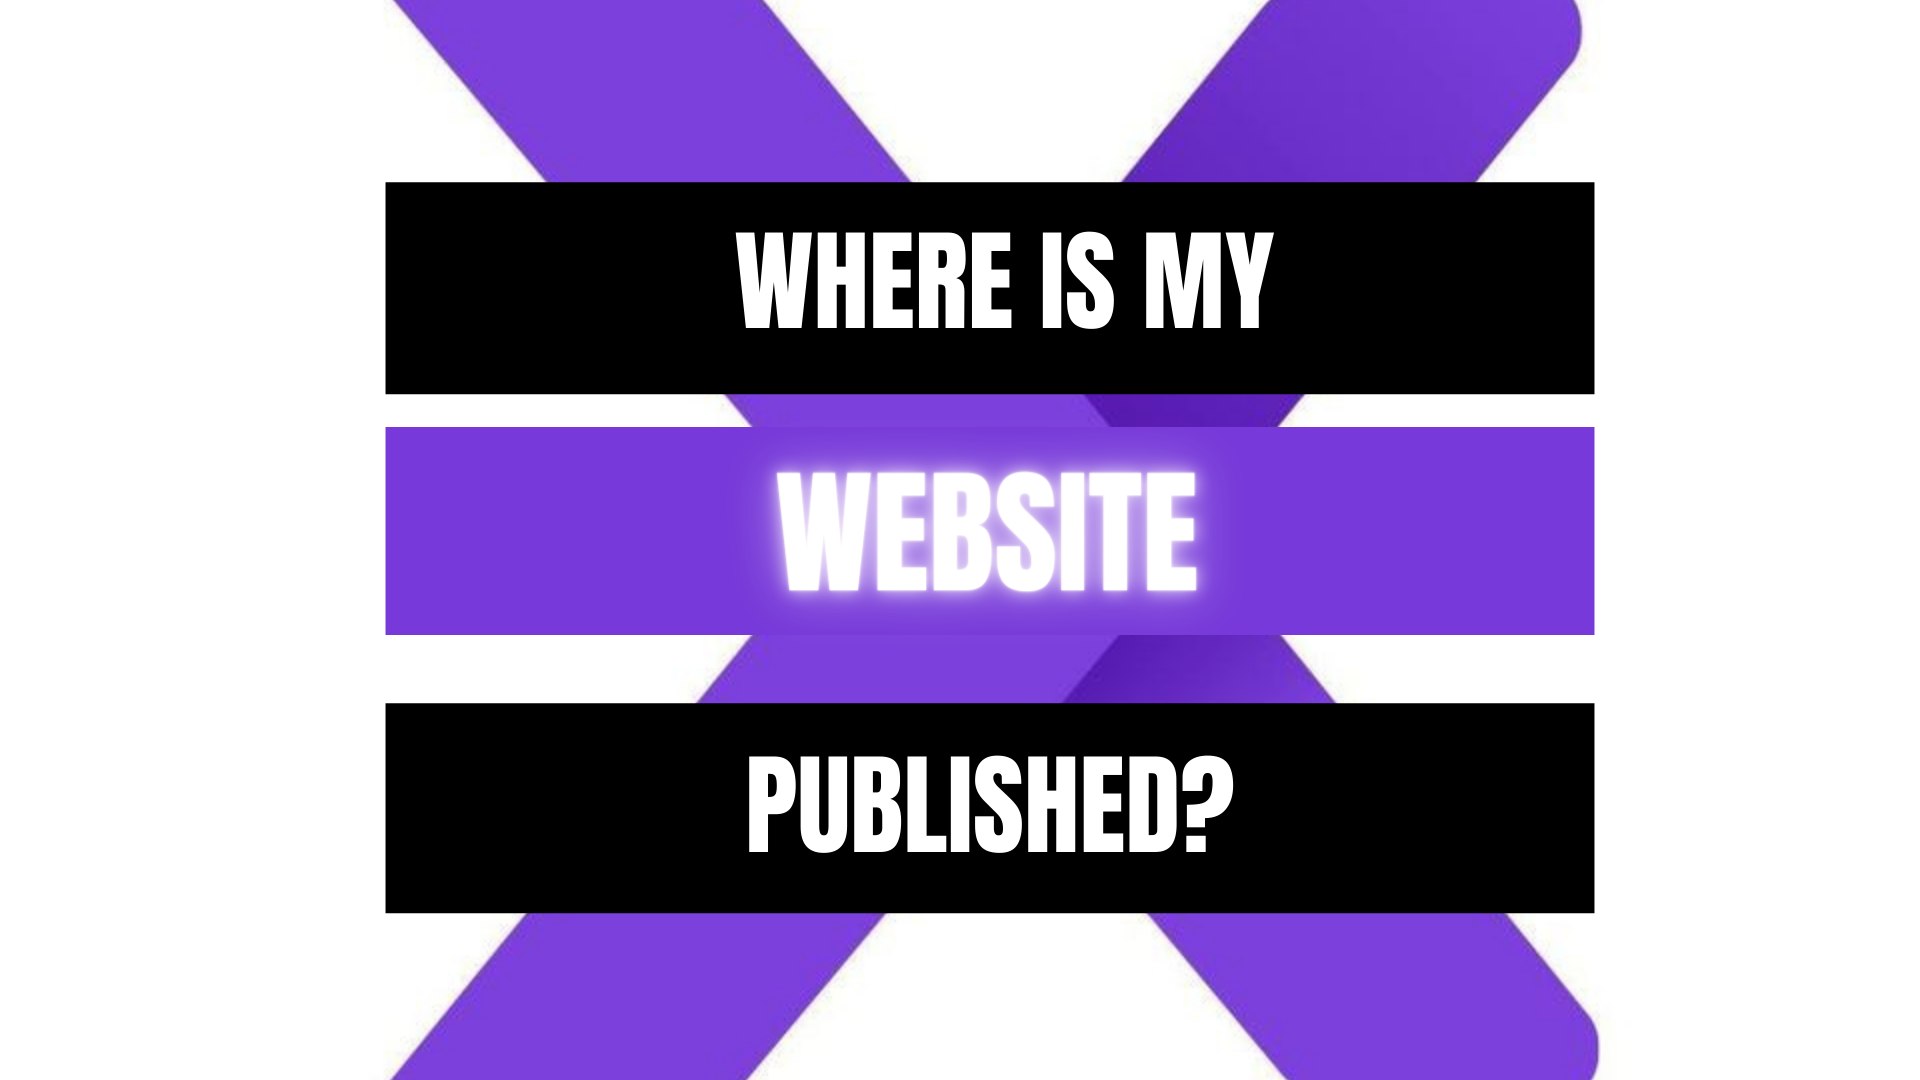 Peekaboox - Website Publishing